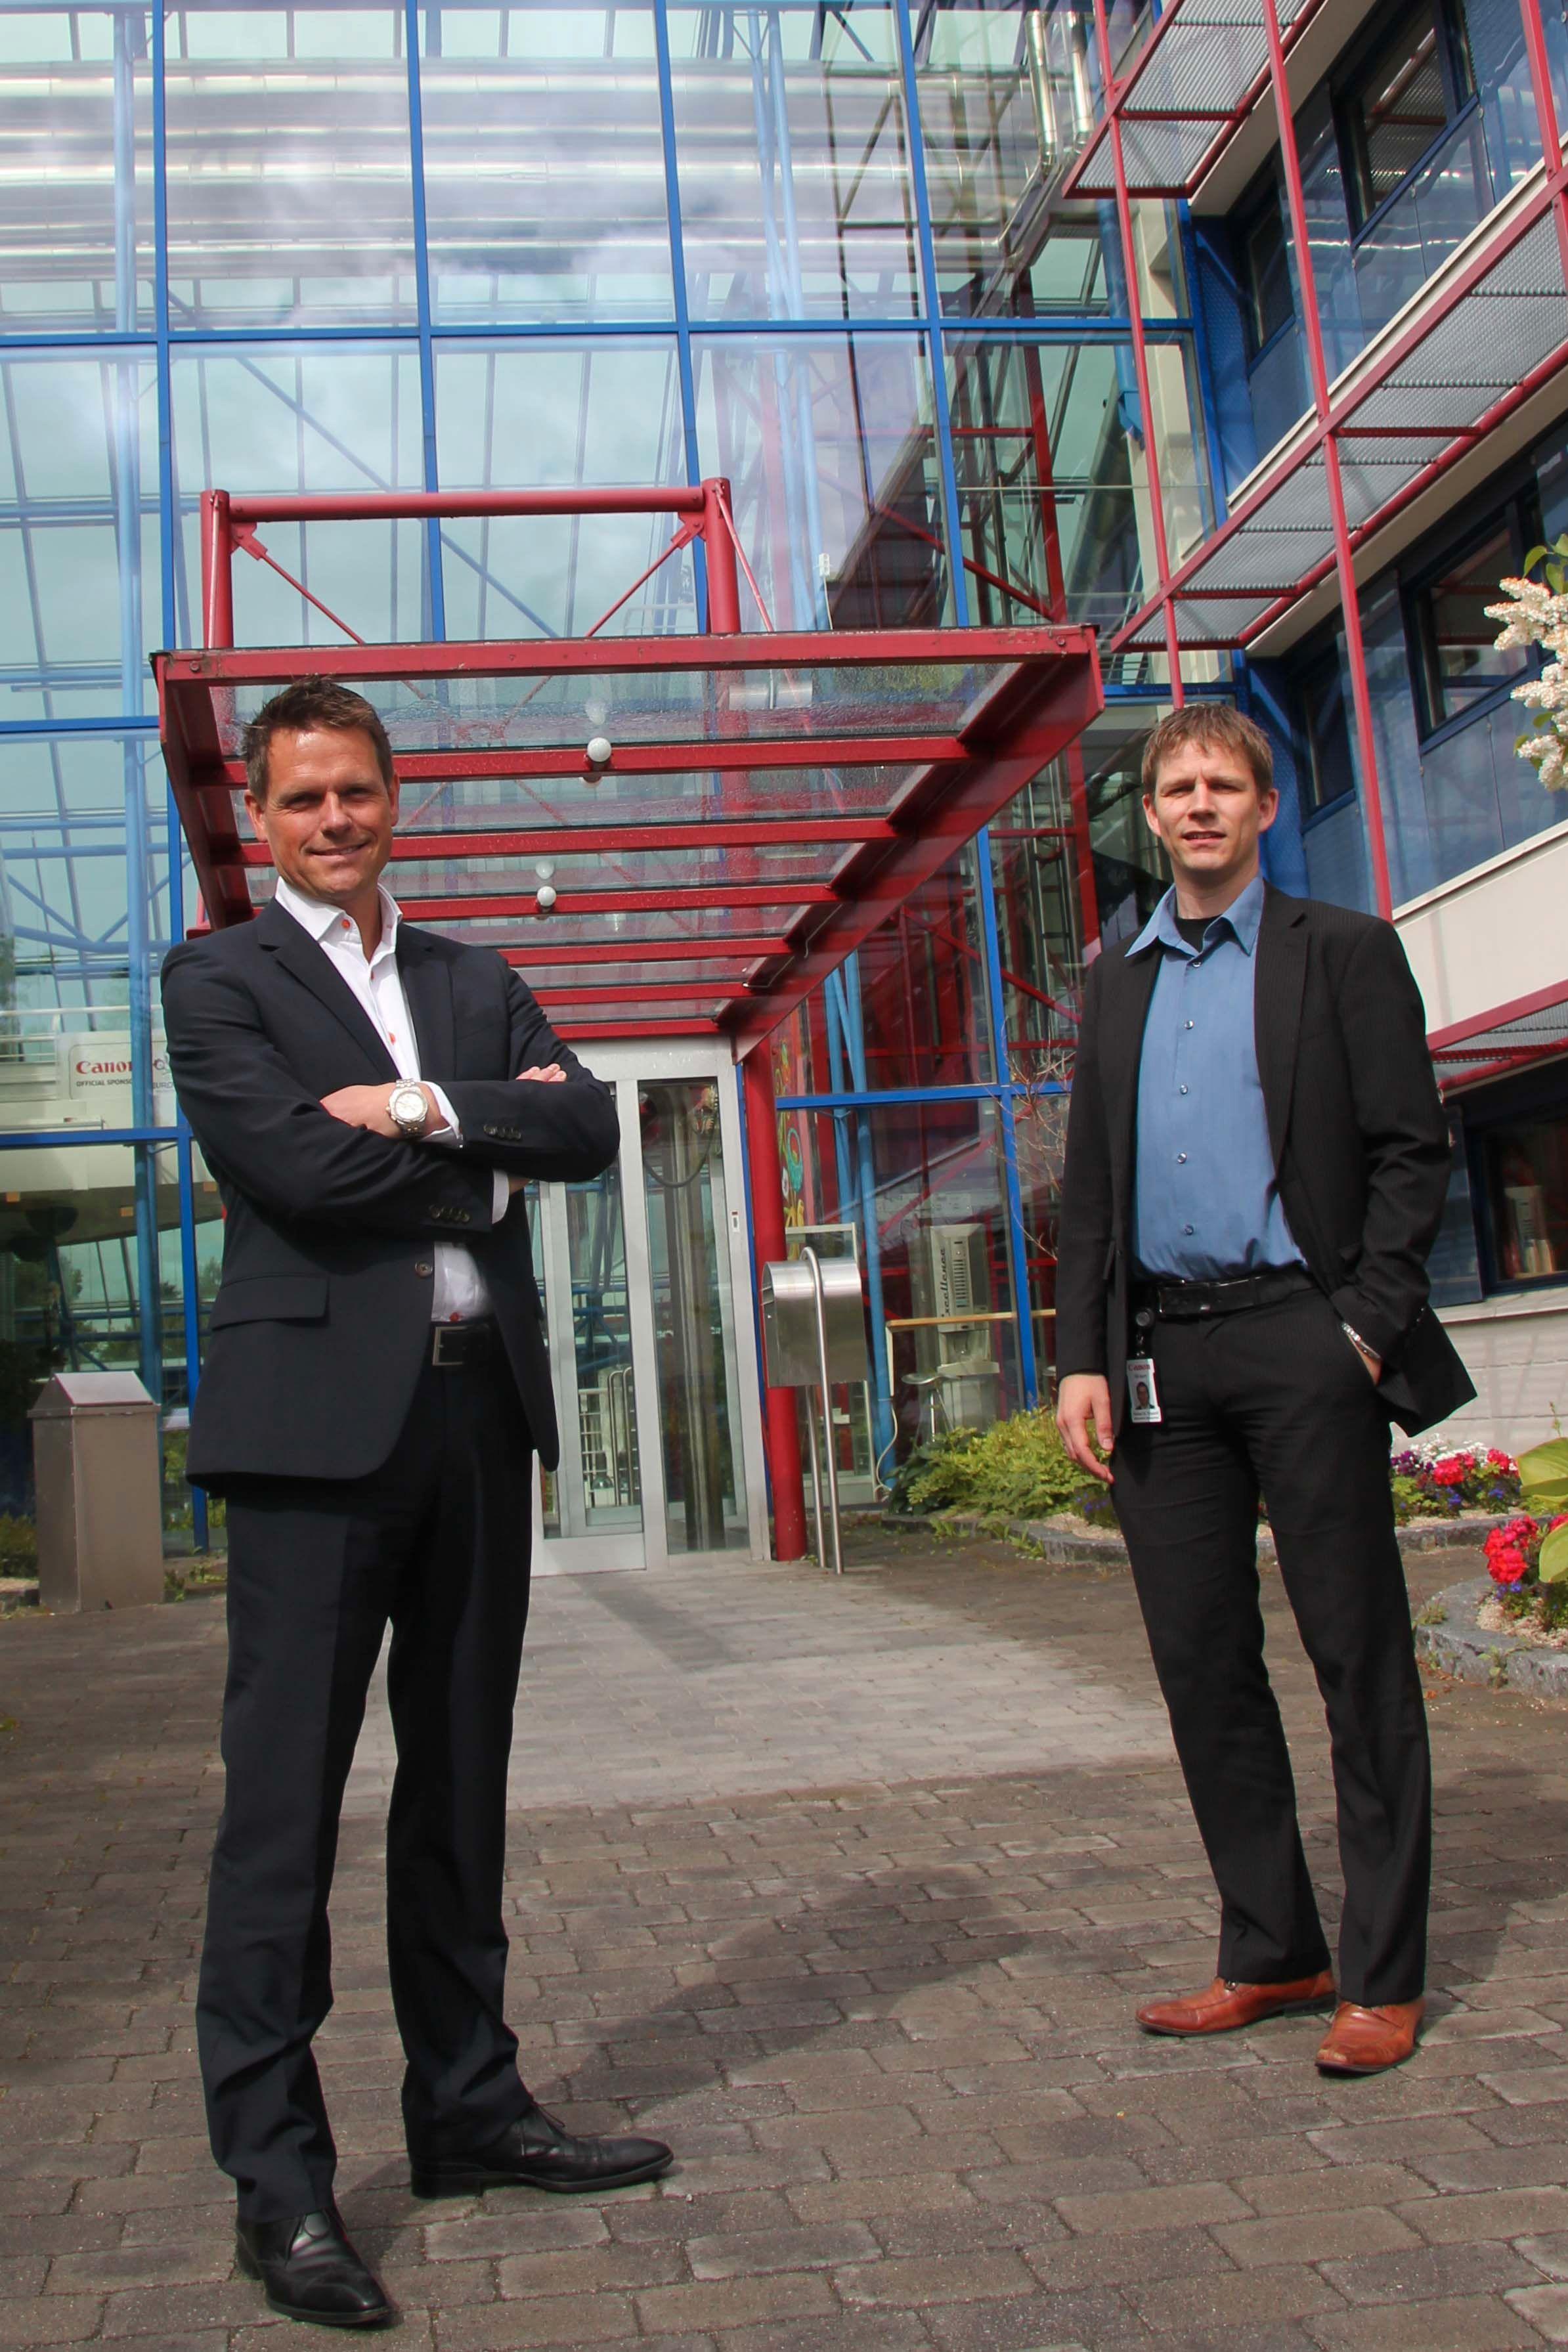 Vidar Vorpenes (venstre) og Steinar H. Nygaard foran inngangen til det spektakulære Canon-bygget på Holmlia.Foto: Atle Skretting